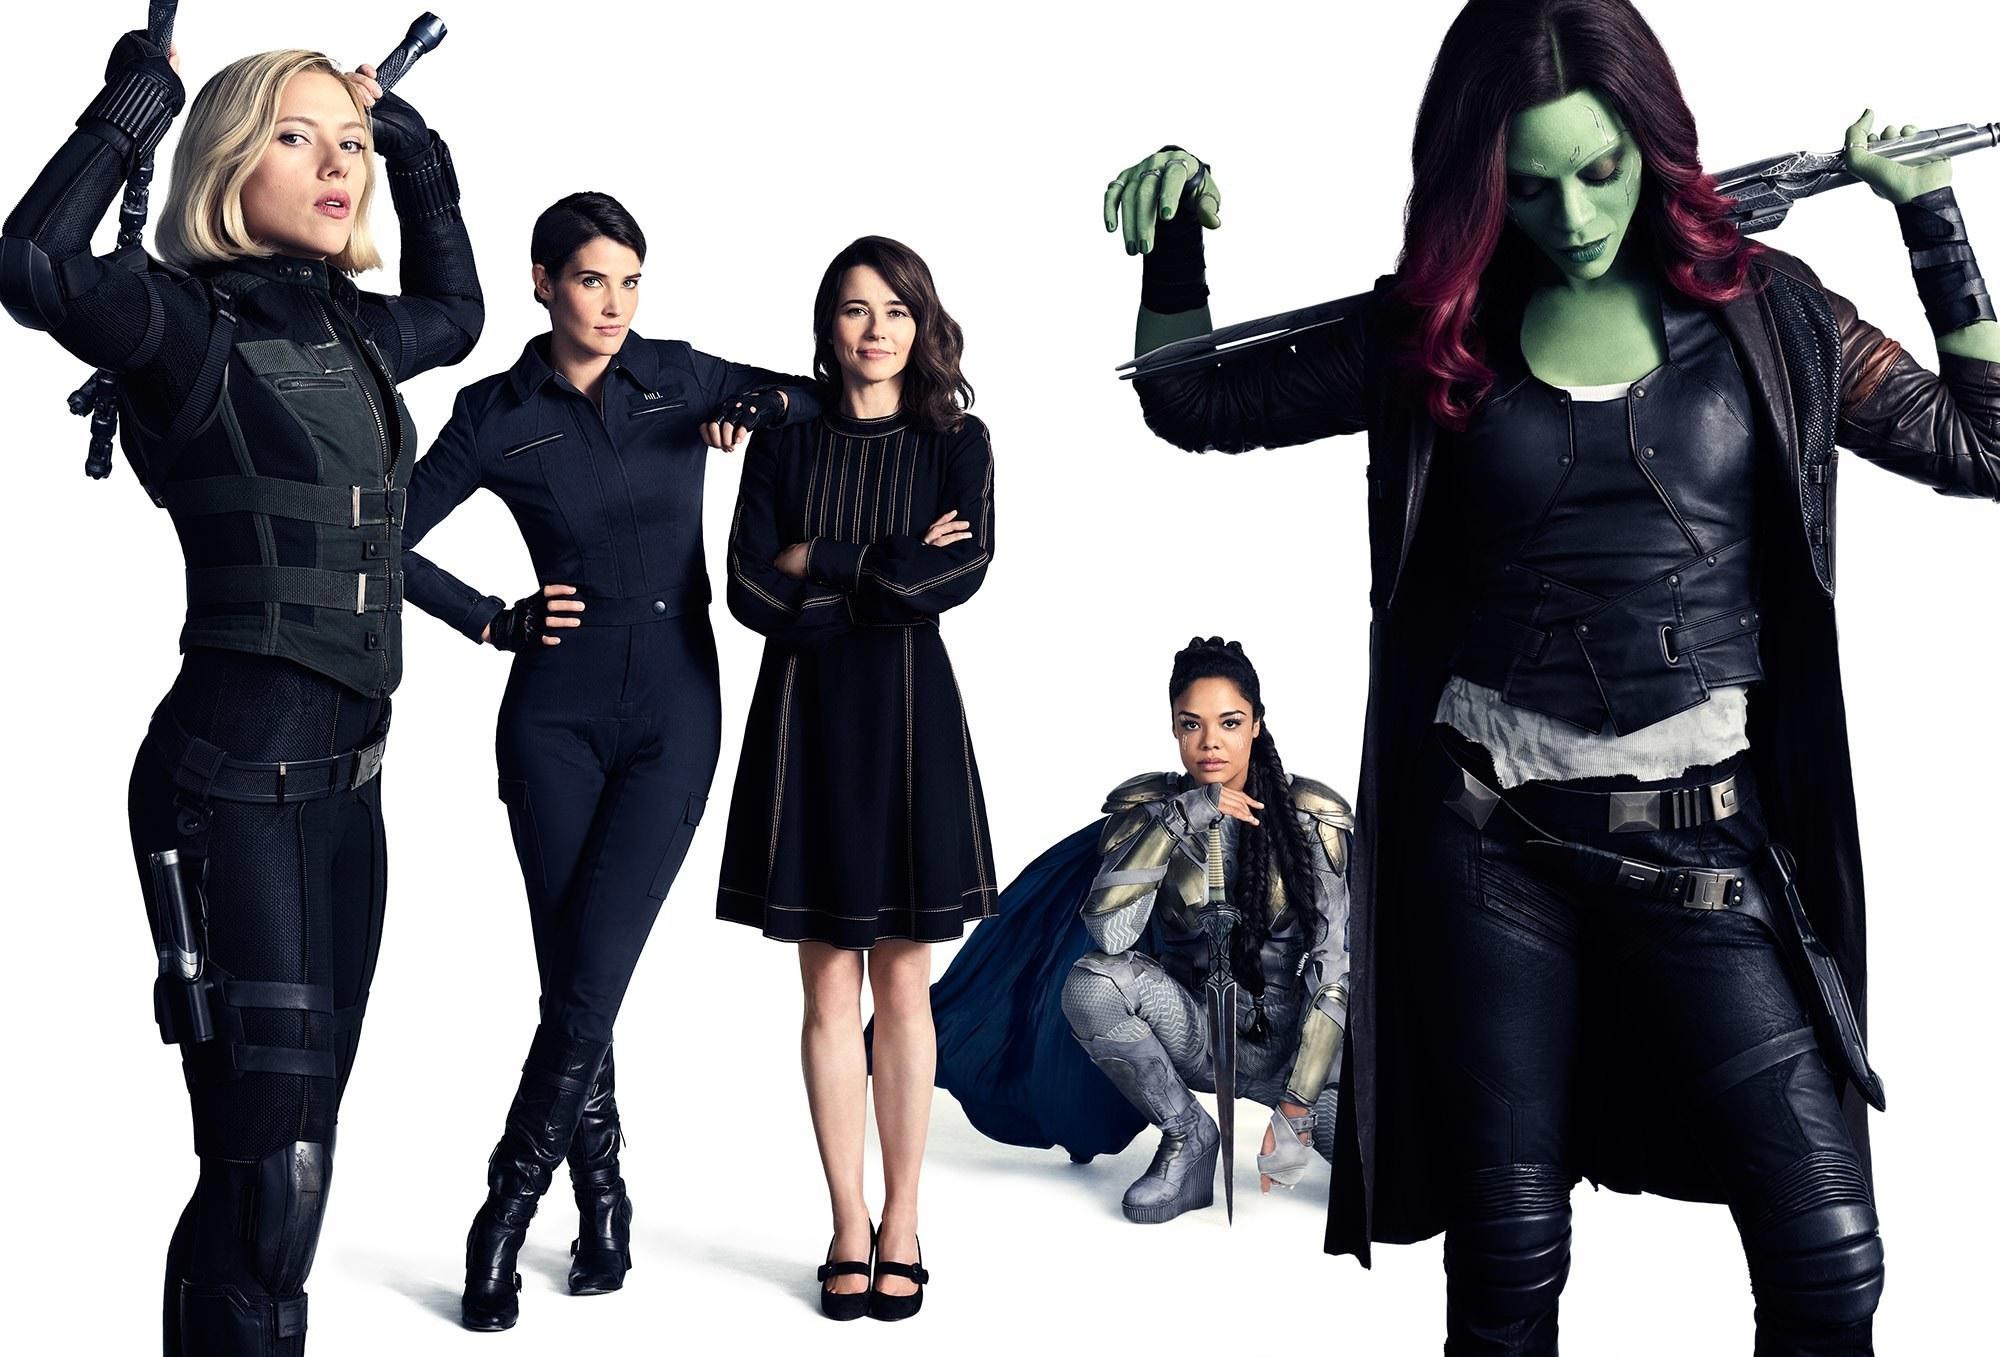 Avengers Infinity War Black Widow Gamora Valkyrie Hd